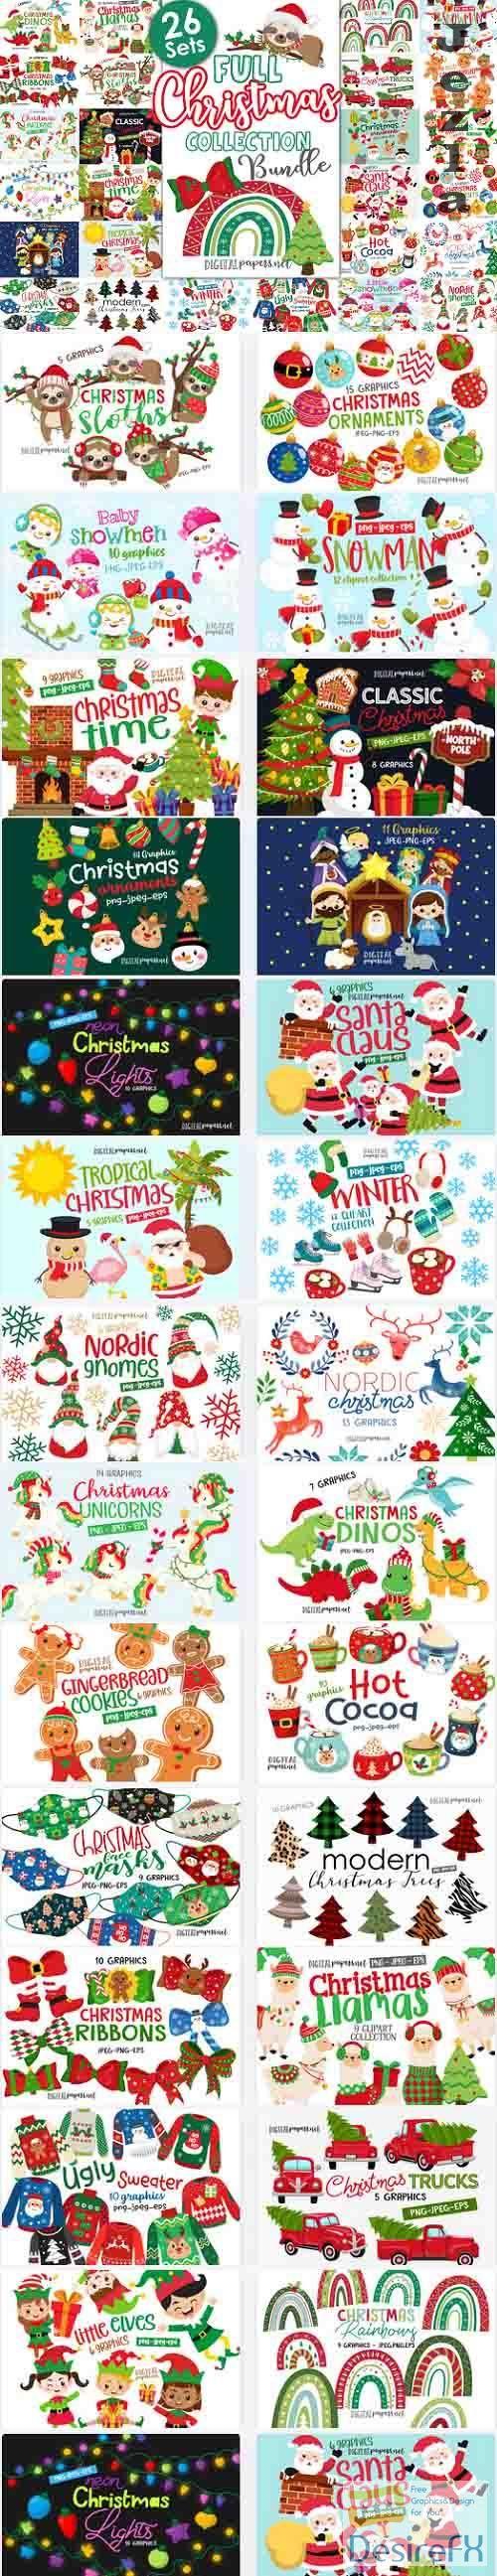 Full Christmas Collection Bundle - 26 Premium Graphics